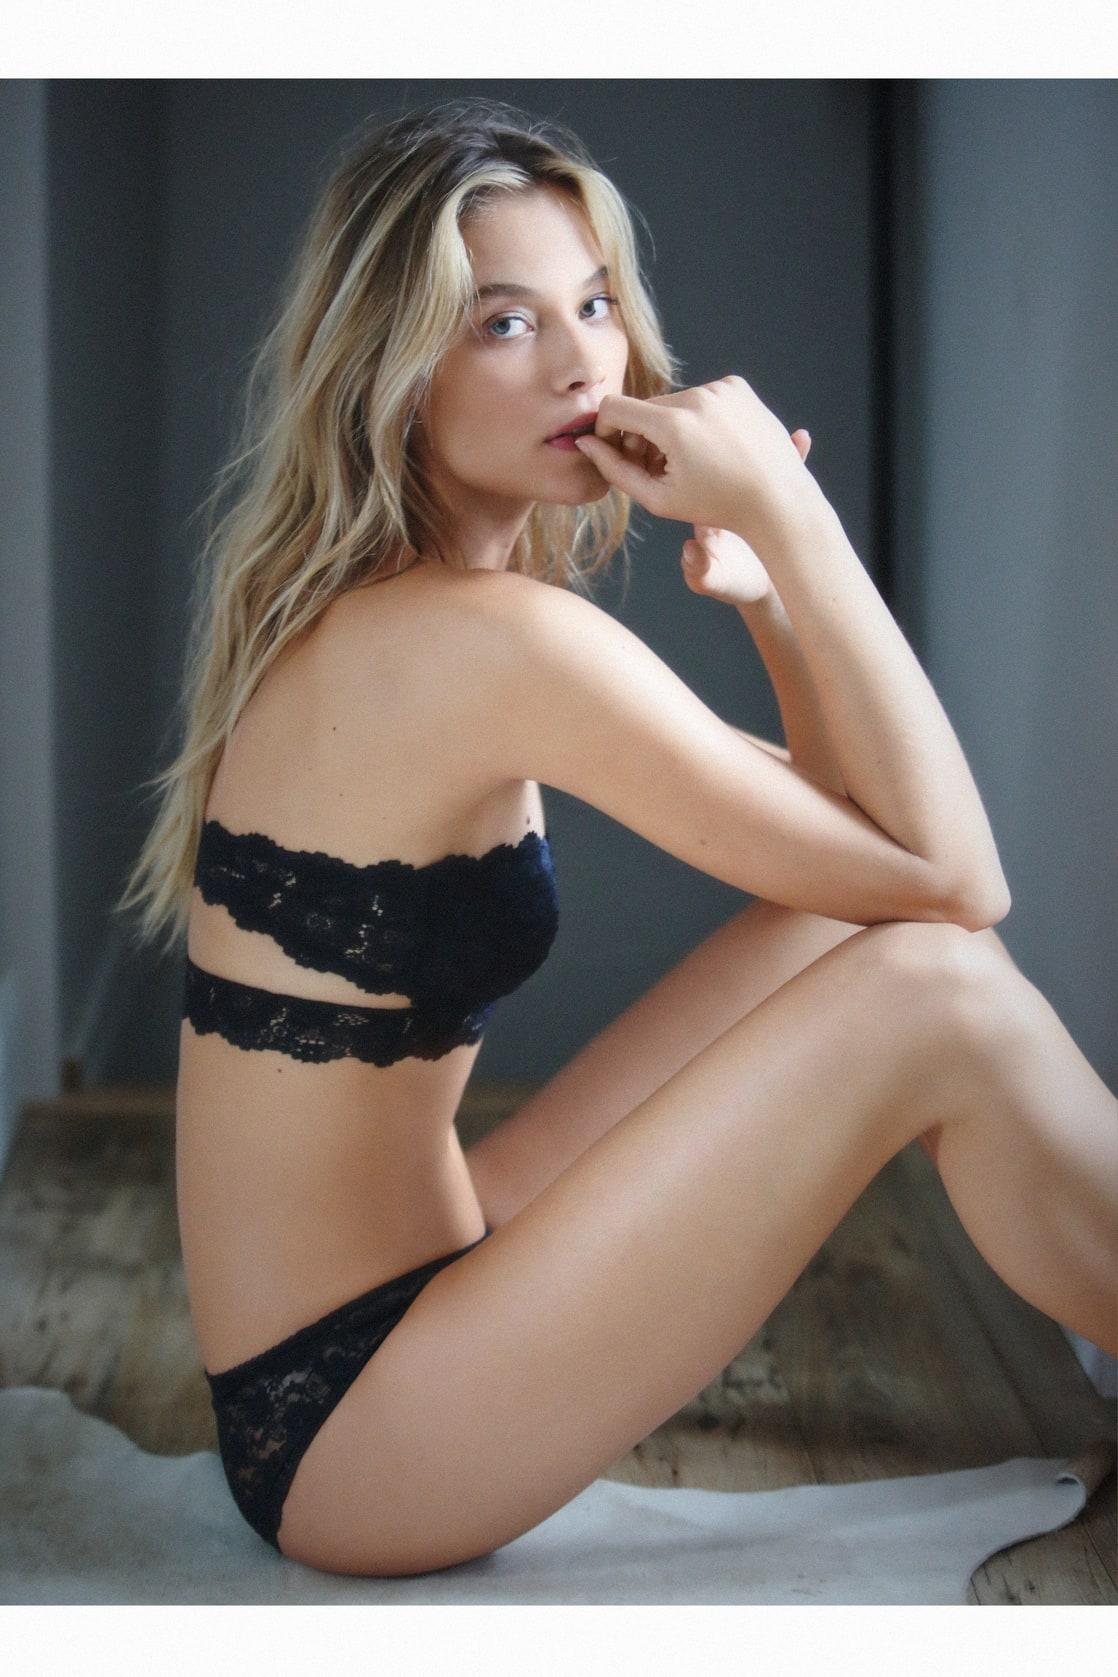 Pamela anderson nudes picture